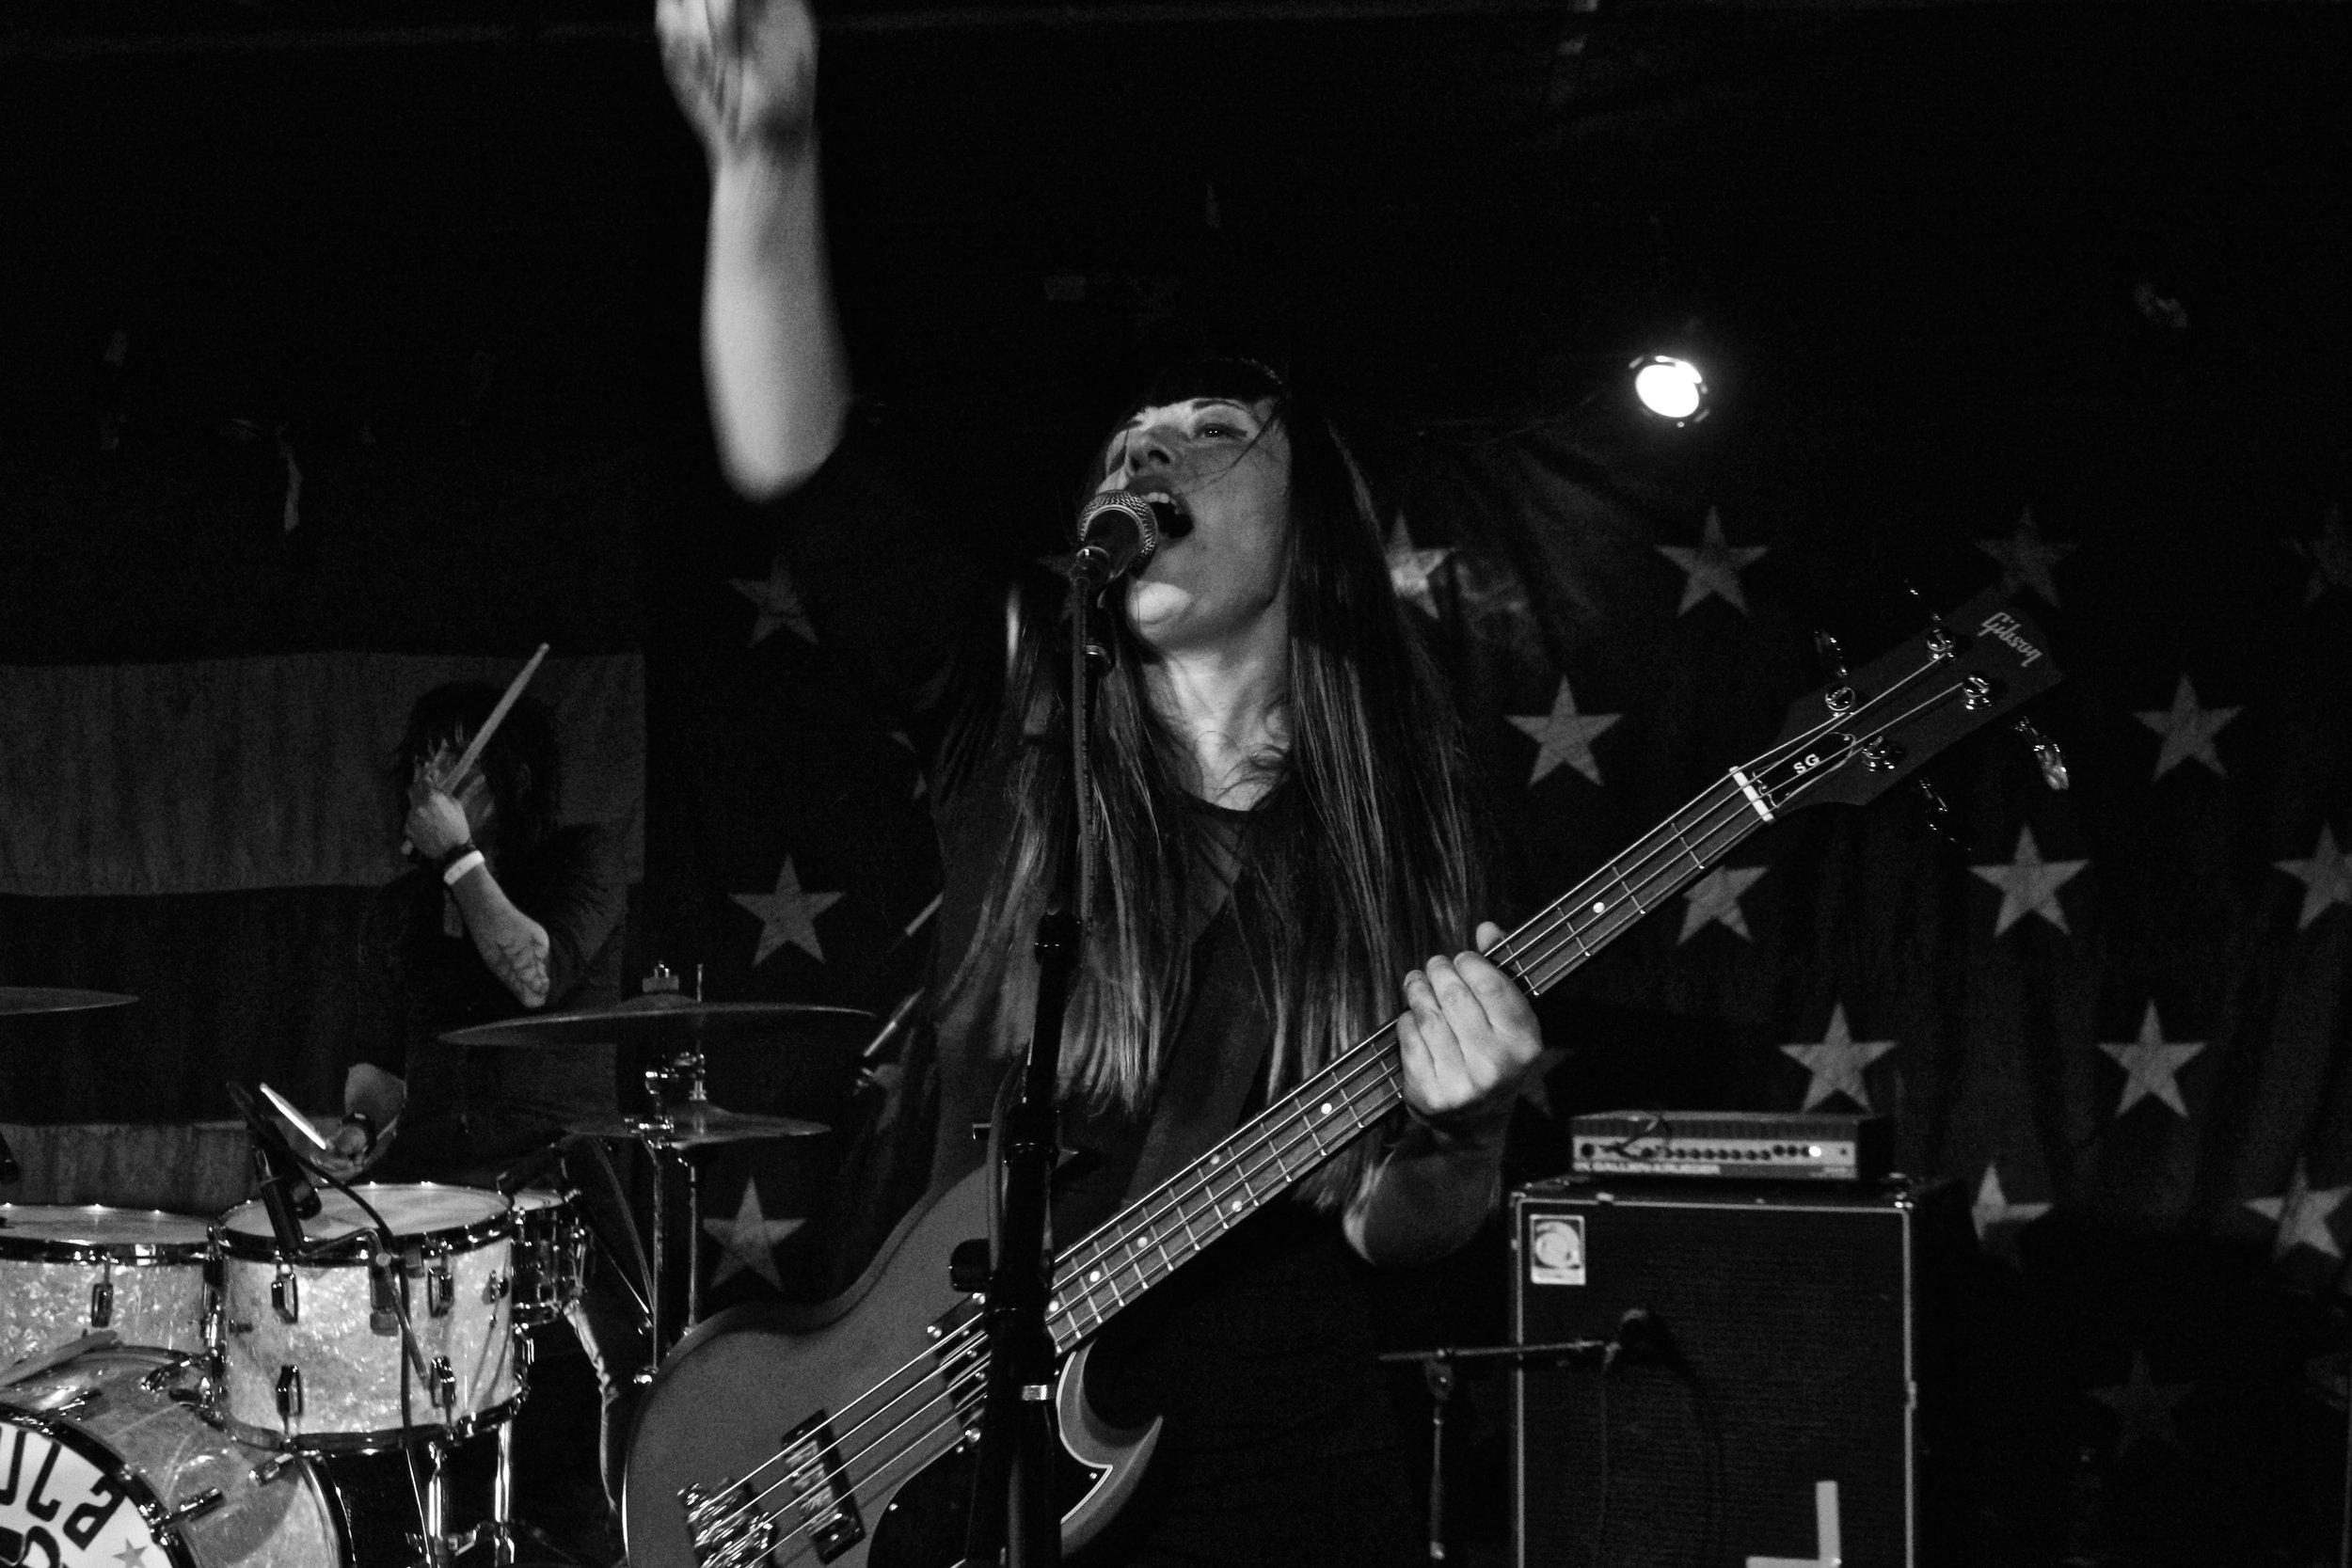 Capsula. The Nick, Birmingham, AL. 2015.